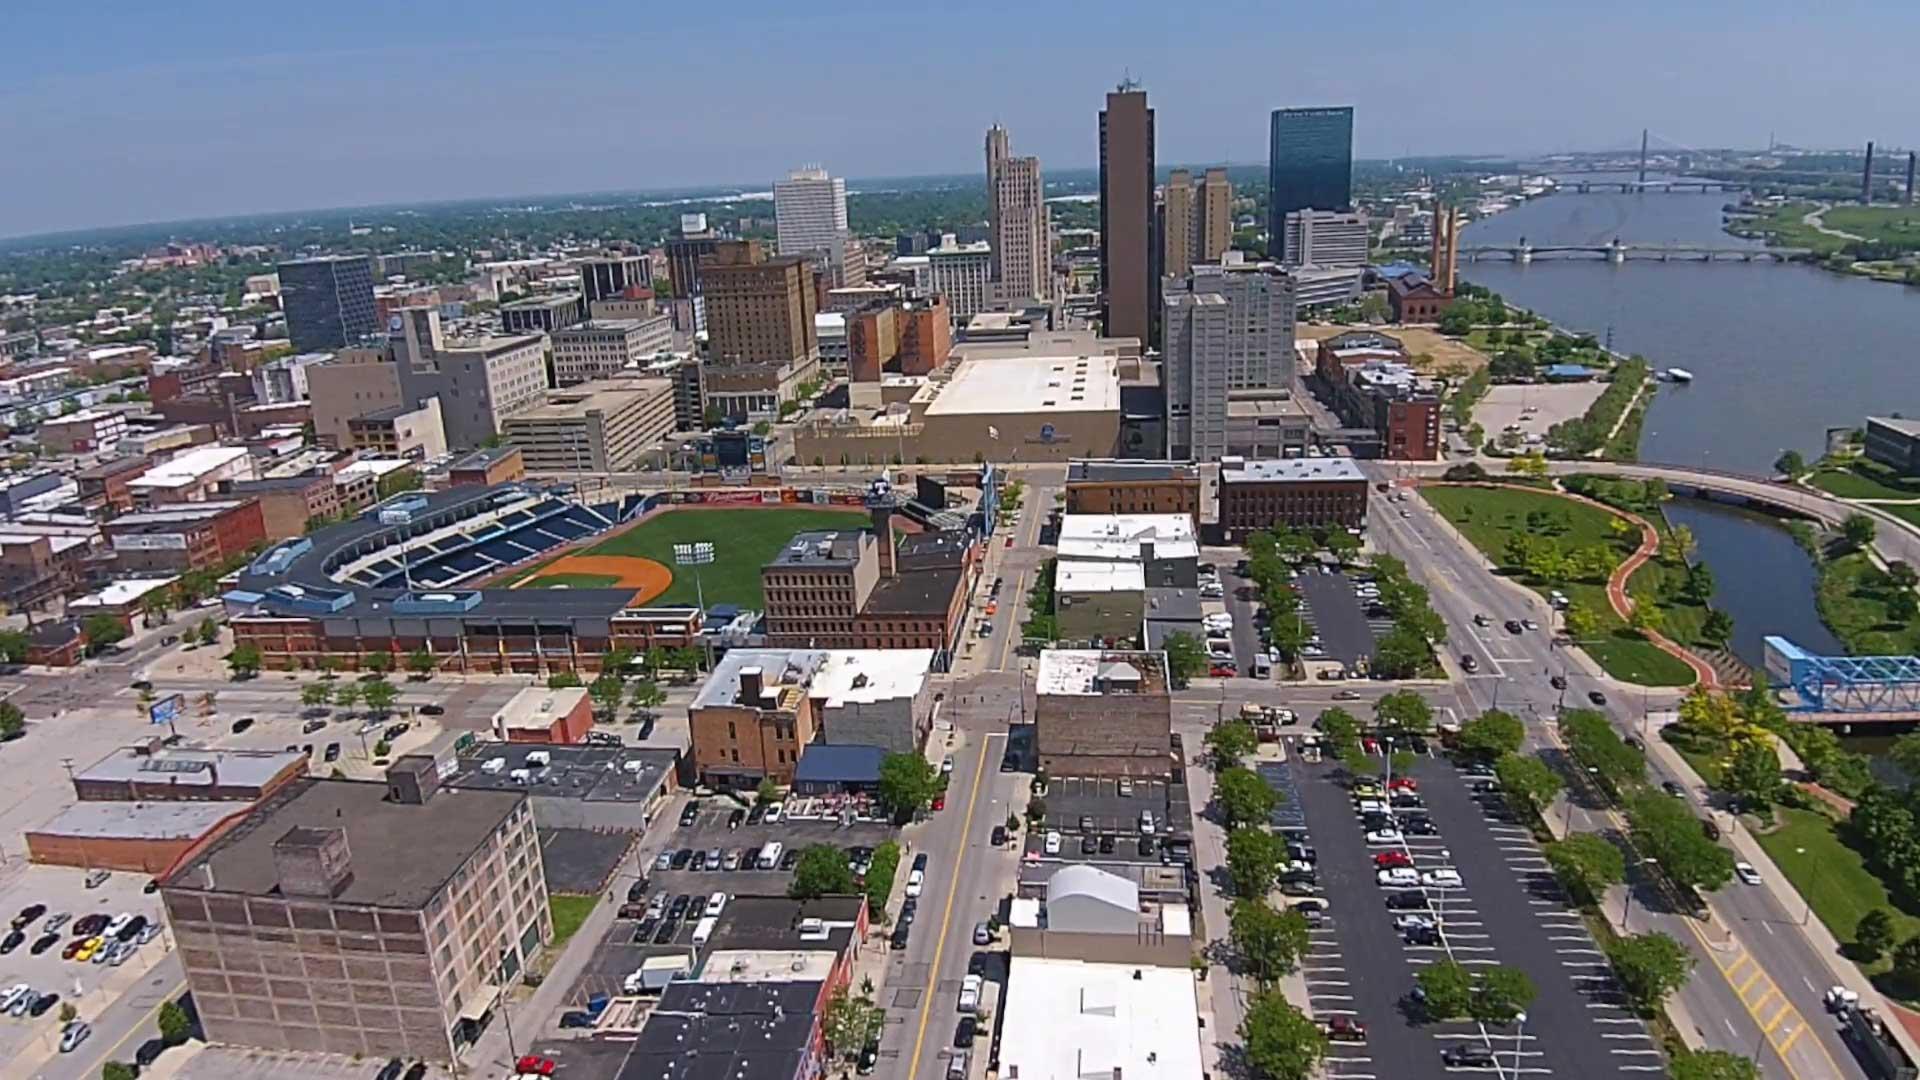 Relocation Guide 2021: Moving to Toledo, Ohio